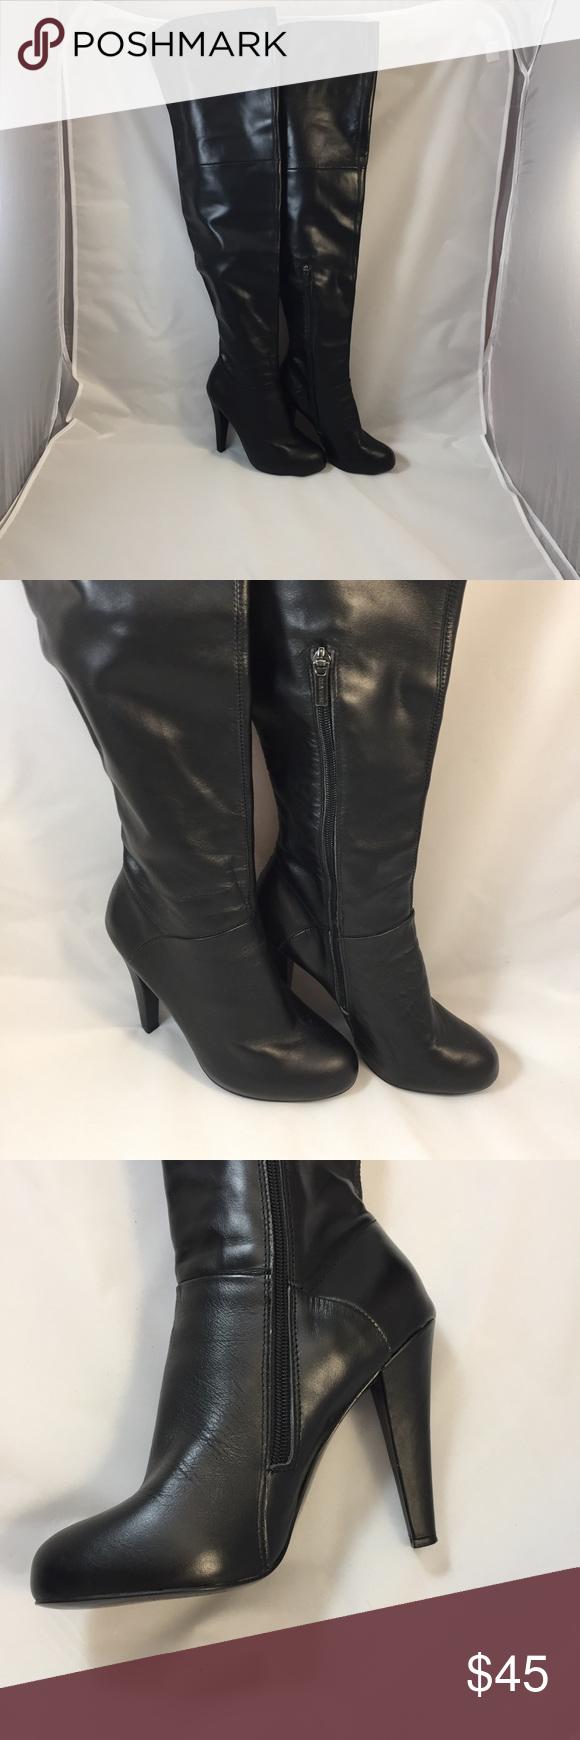 Colin Stuart Thigh High Black Boots Size 7.5B Z Colin Stuart Shoes Over the Knee Boots